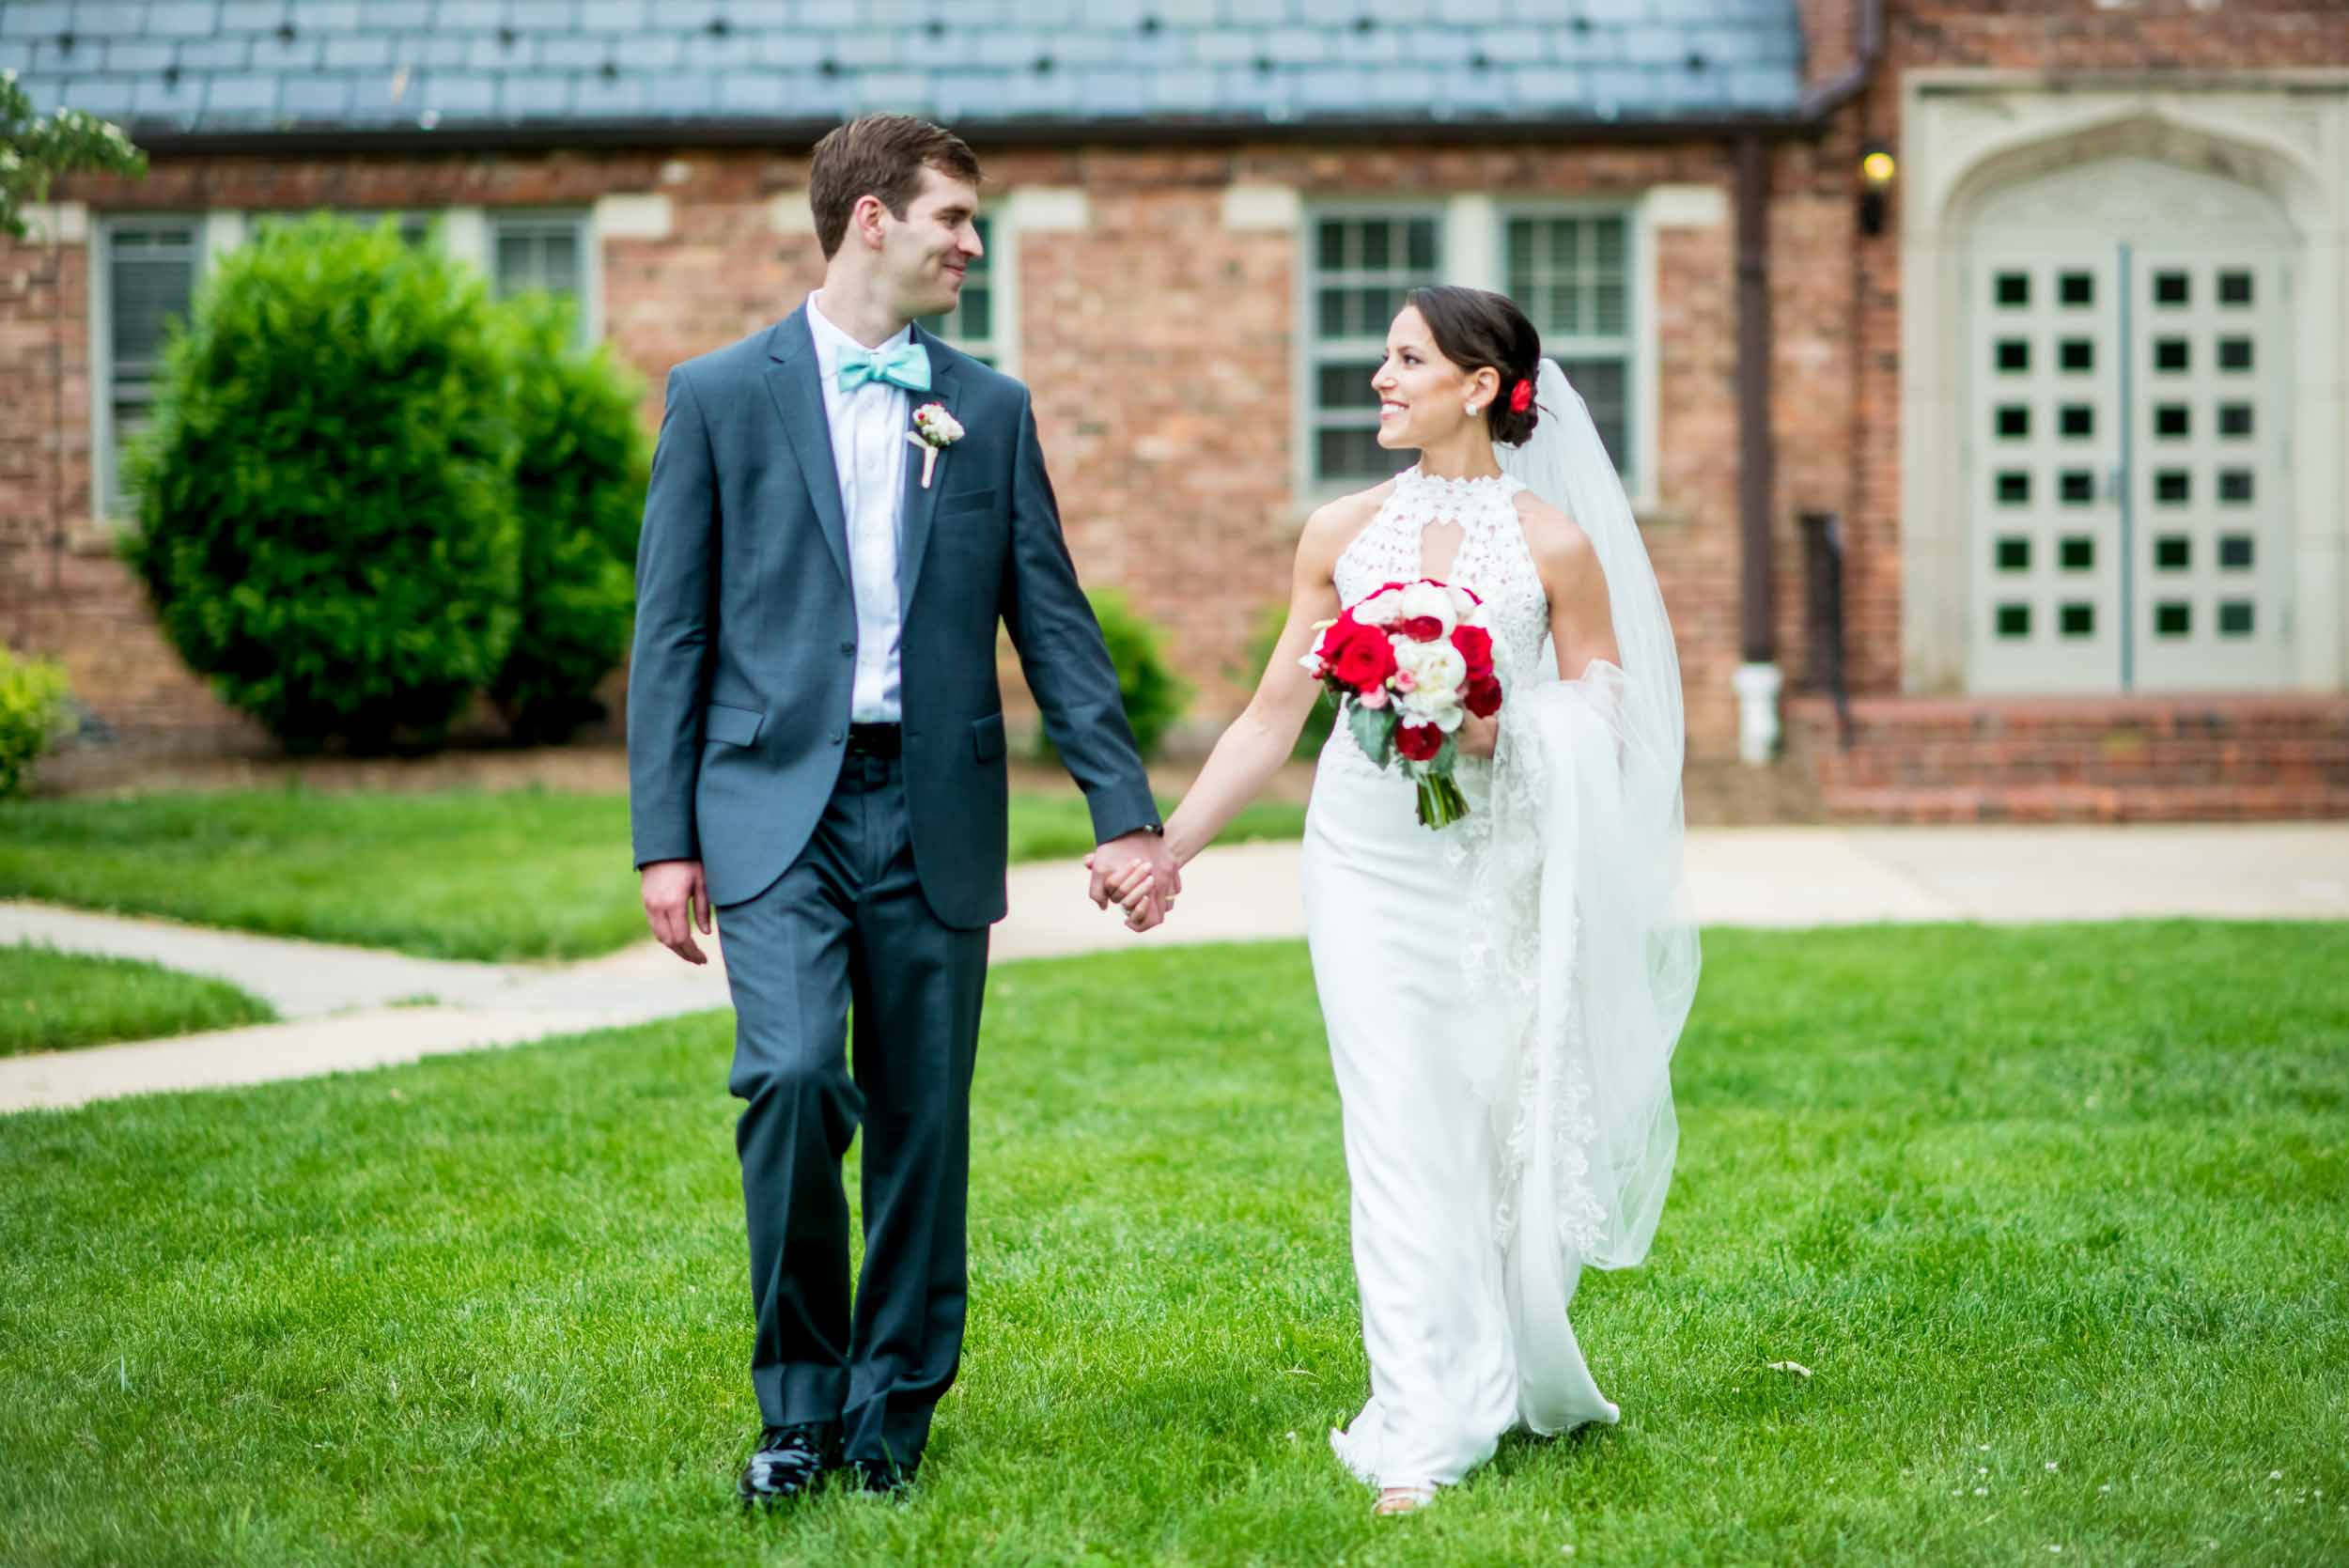 dc+metro+wedding+photographer+vadym+guliuk+photography+wedding+bride+and+groom-2053.jpg